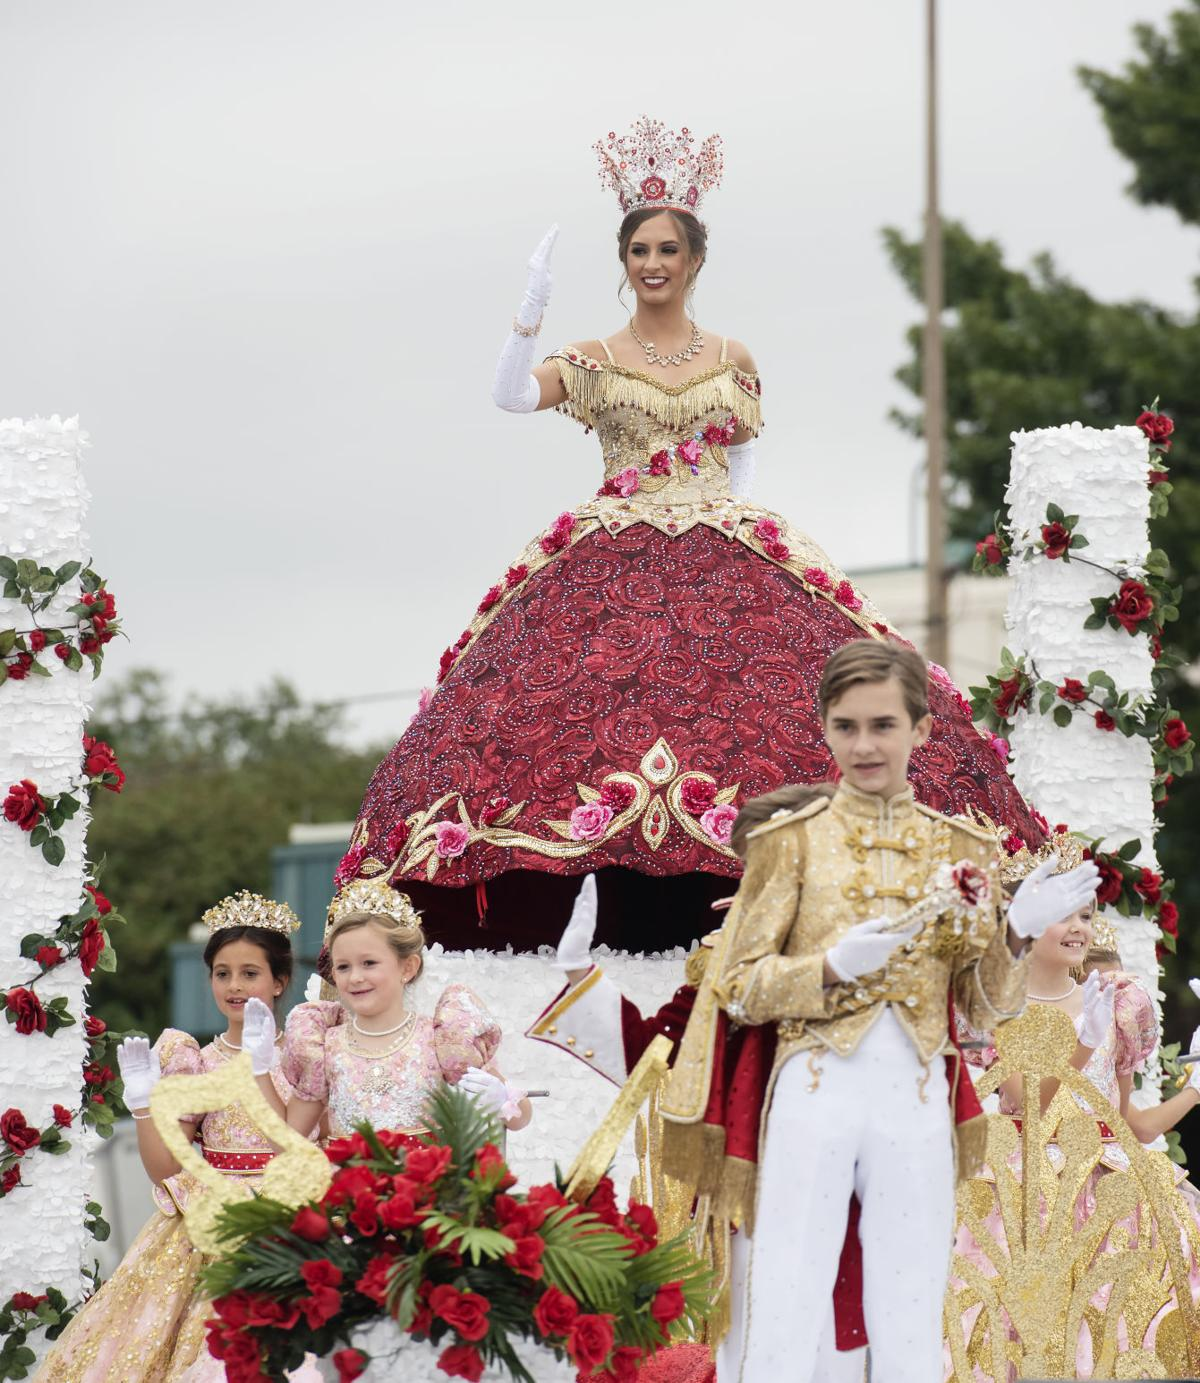 20181017_local_rose_festival_parade_04.JPG